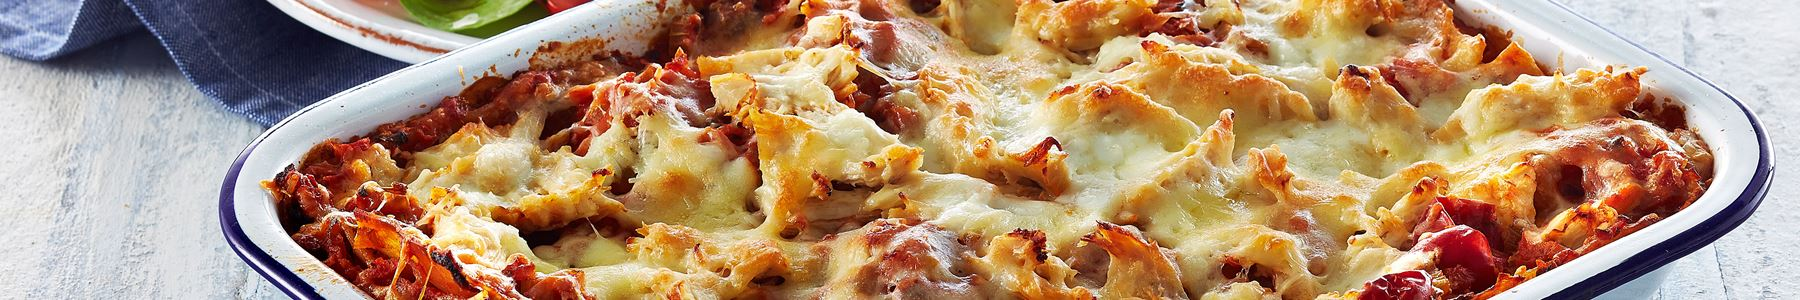 Basilikum + Mozzarella